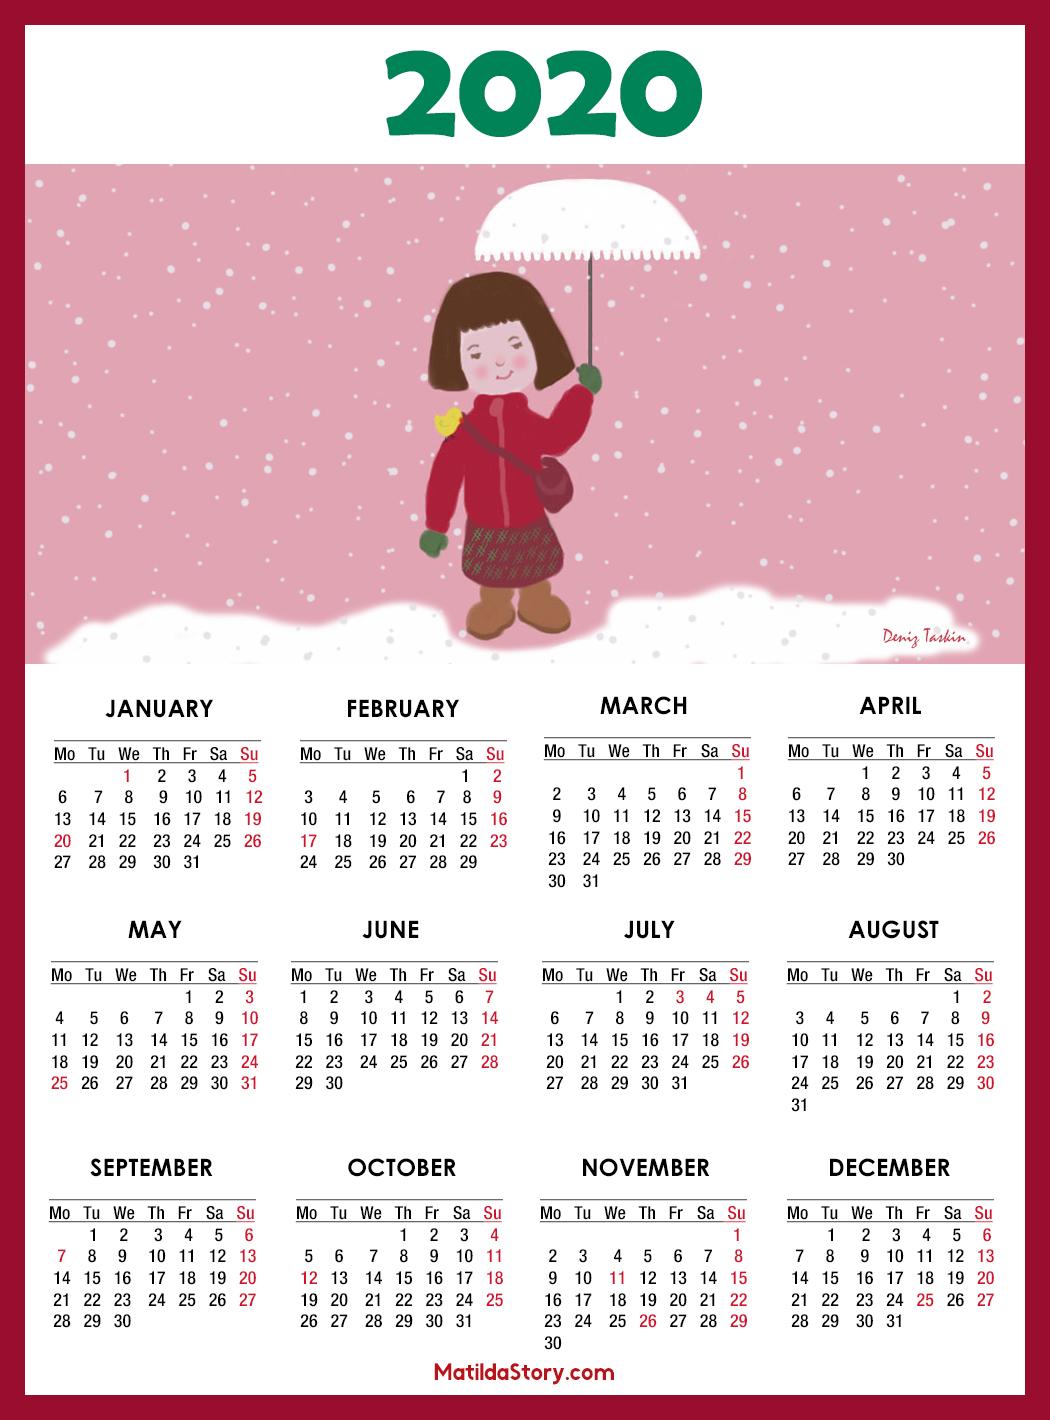 Calendar 2020 Printable With Us Holidays – Monday Start